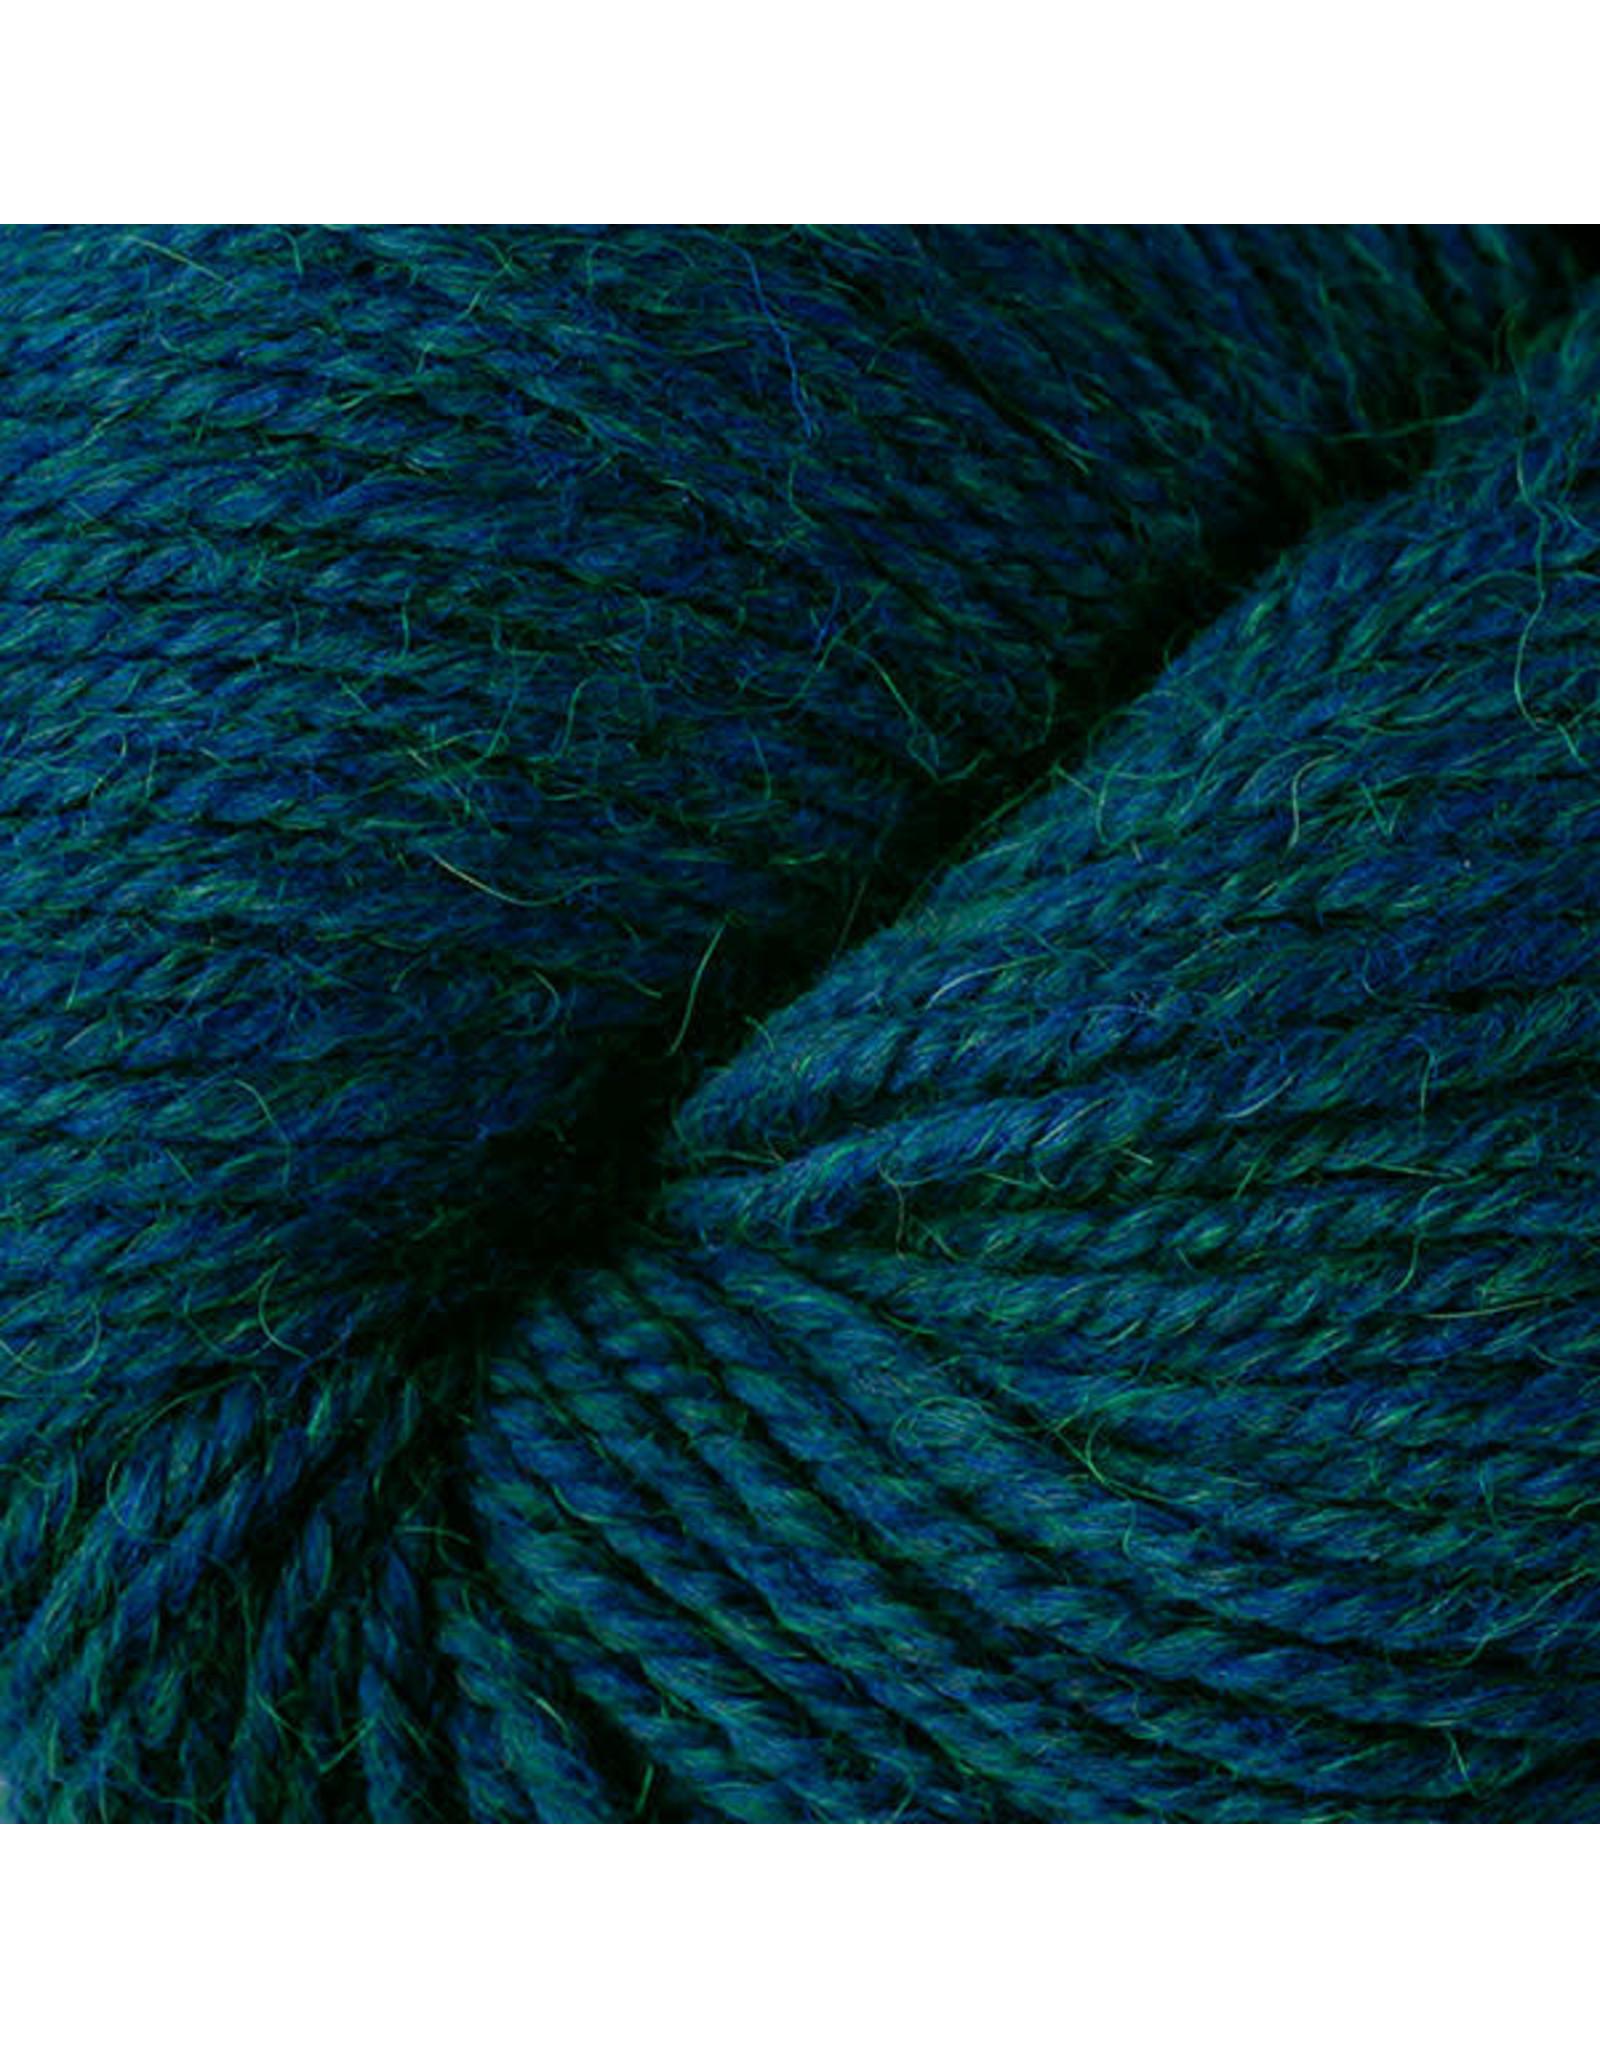 6285 Oceanic Mix - Ultra Alpaca - Berroco